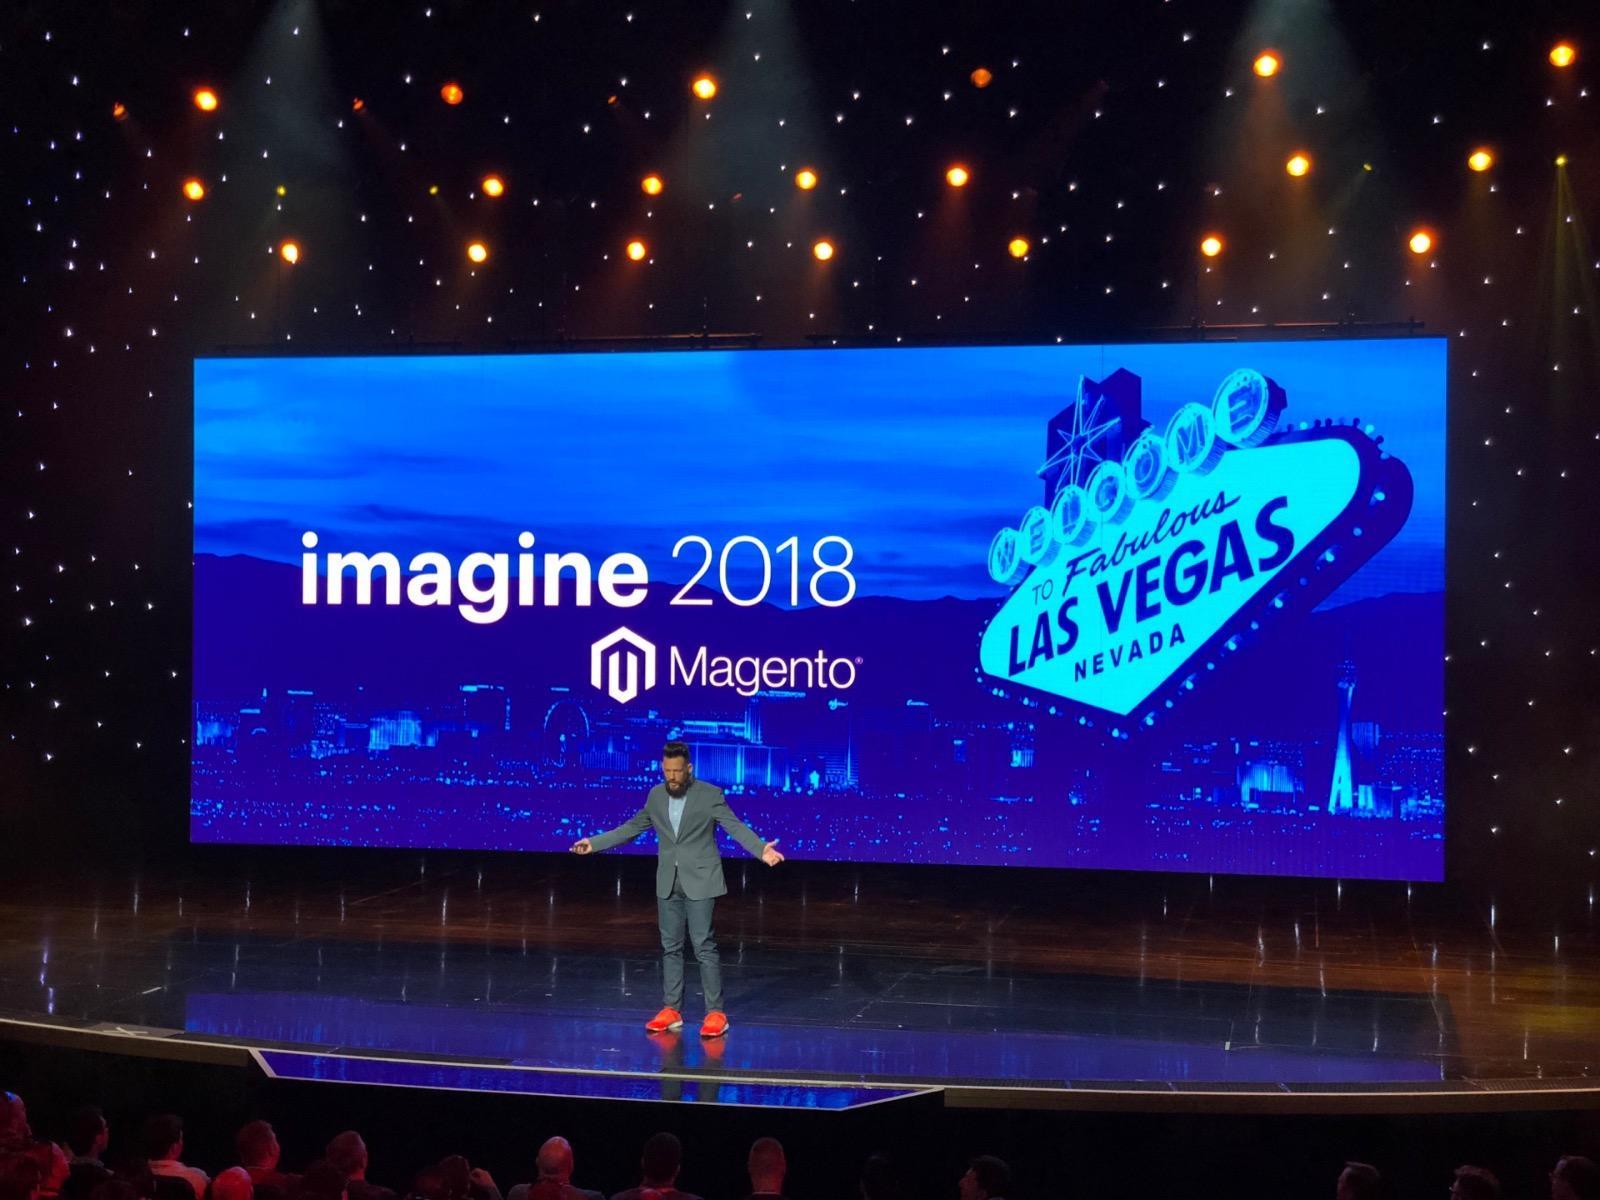 Magento IMAGINE 2018